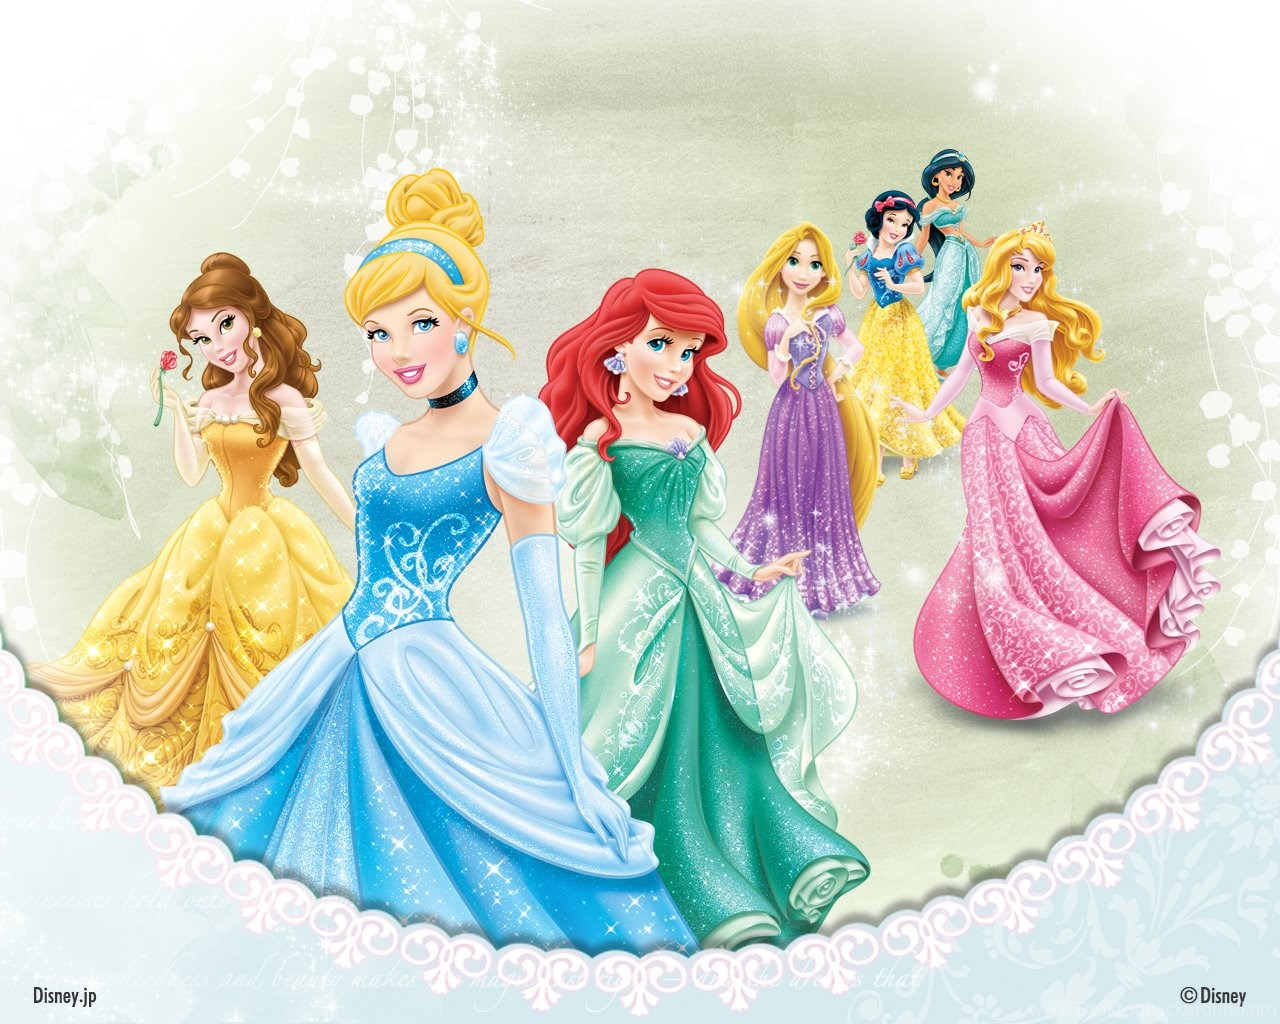 disney princesses wallpapers disney princess wallpapers. Black Bedroom Furniture Sets. Home Design Ideas